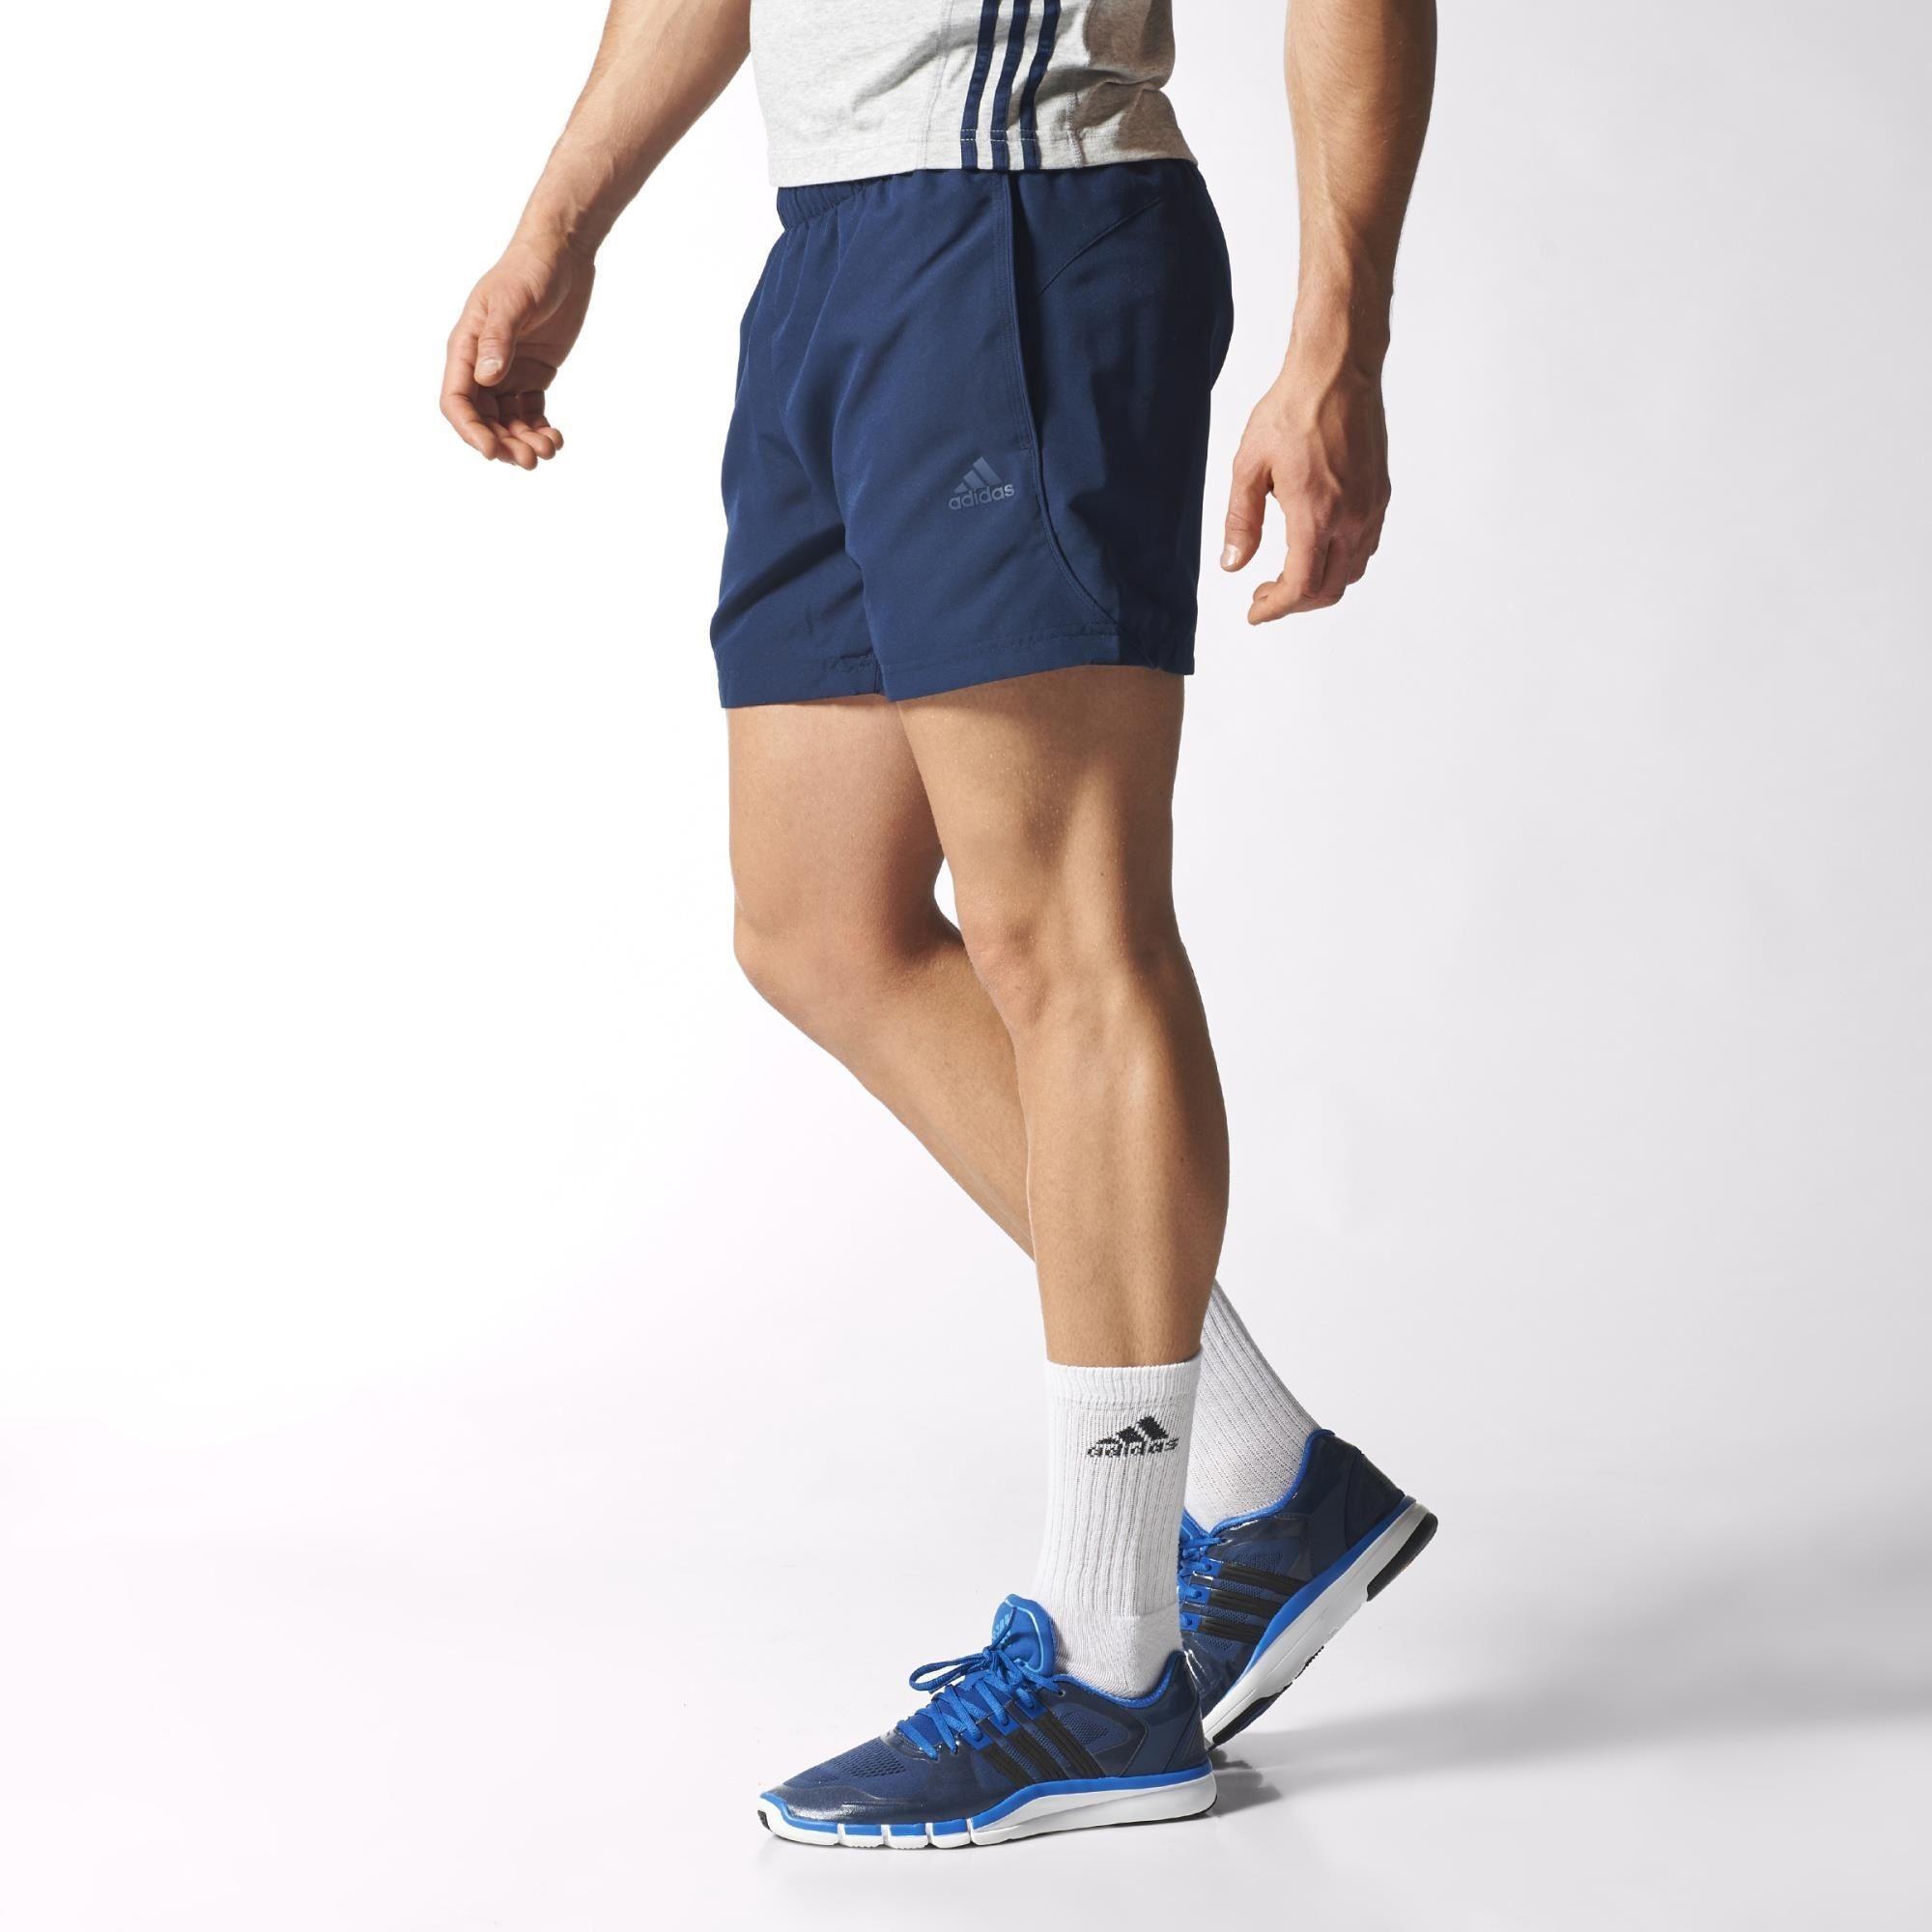 Adidas Shorts Para Correr Supernova Glide Mujer Blue Adidas Mexico Adidas Outfit Men Adidas Men Blue Adidas